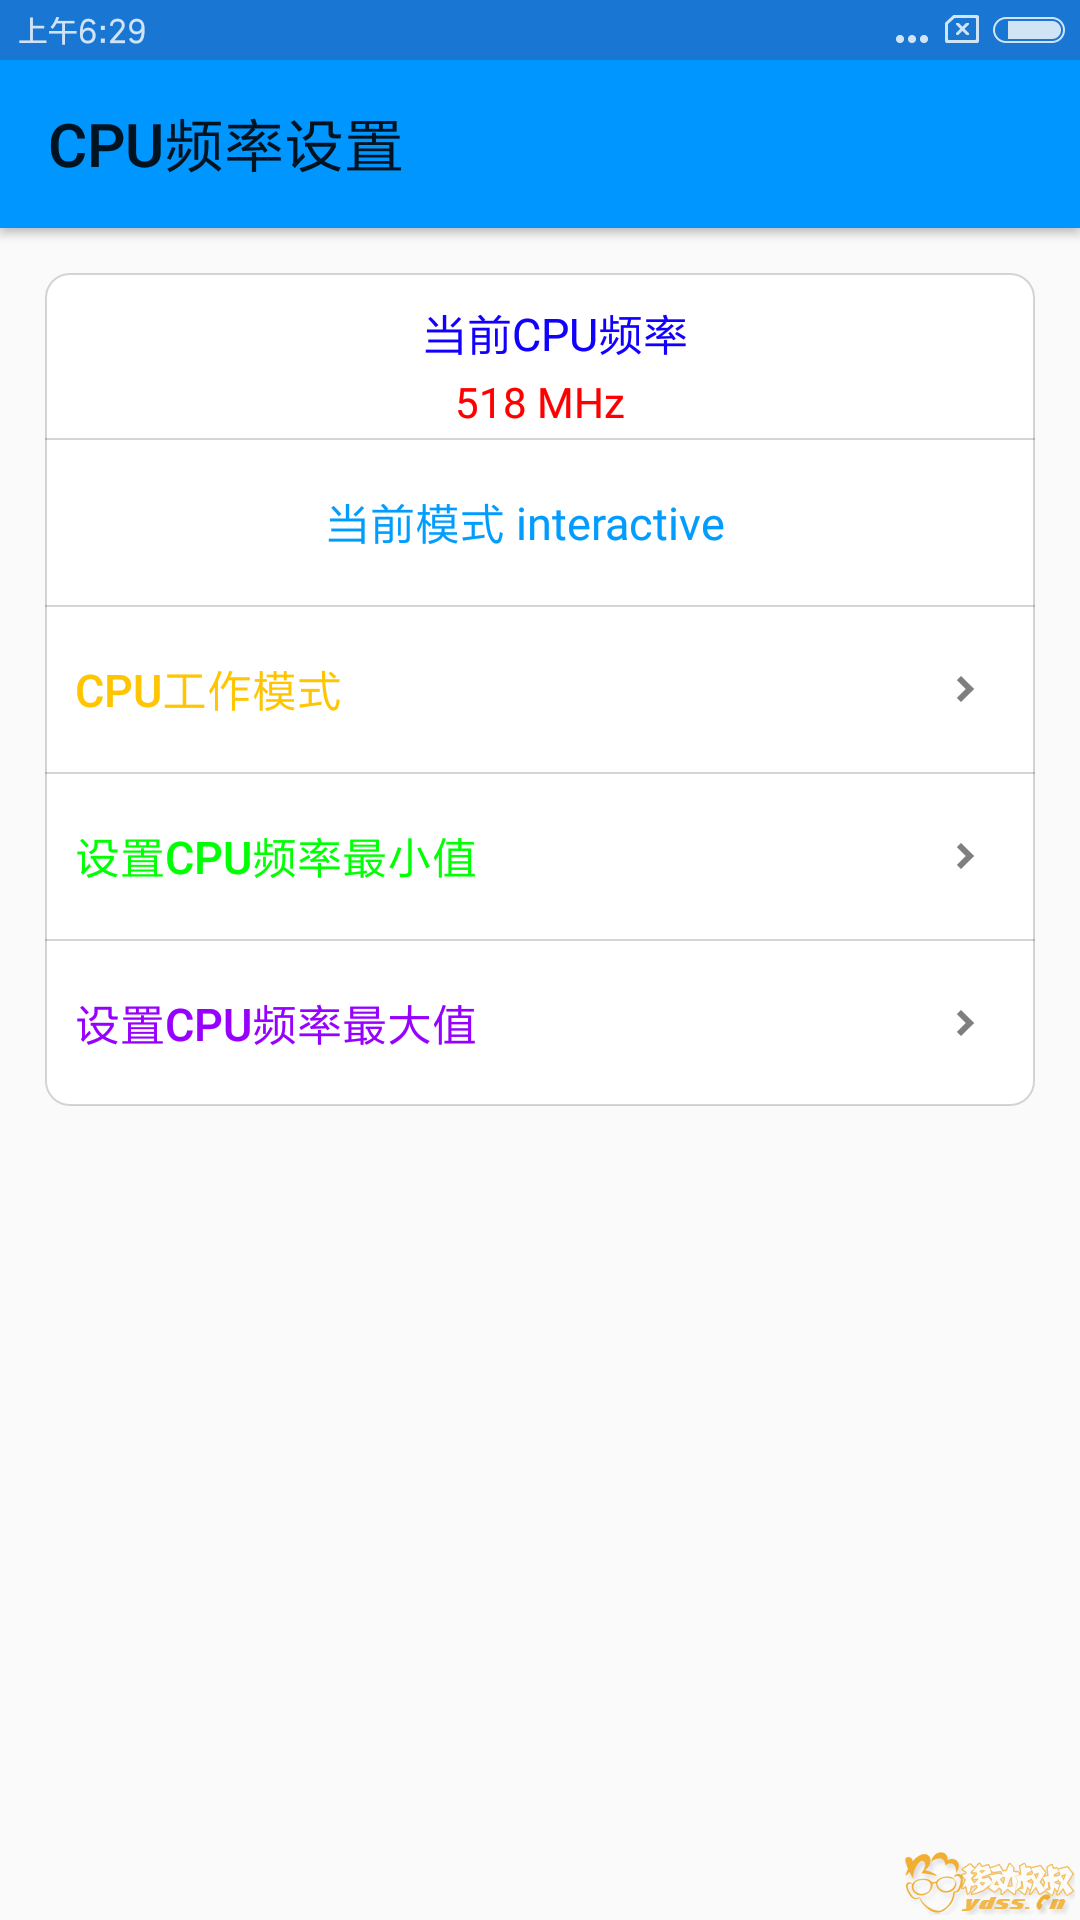 Screenshot_1970-07-28-06-29-04-342_com.zhanhong.tools.png